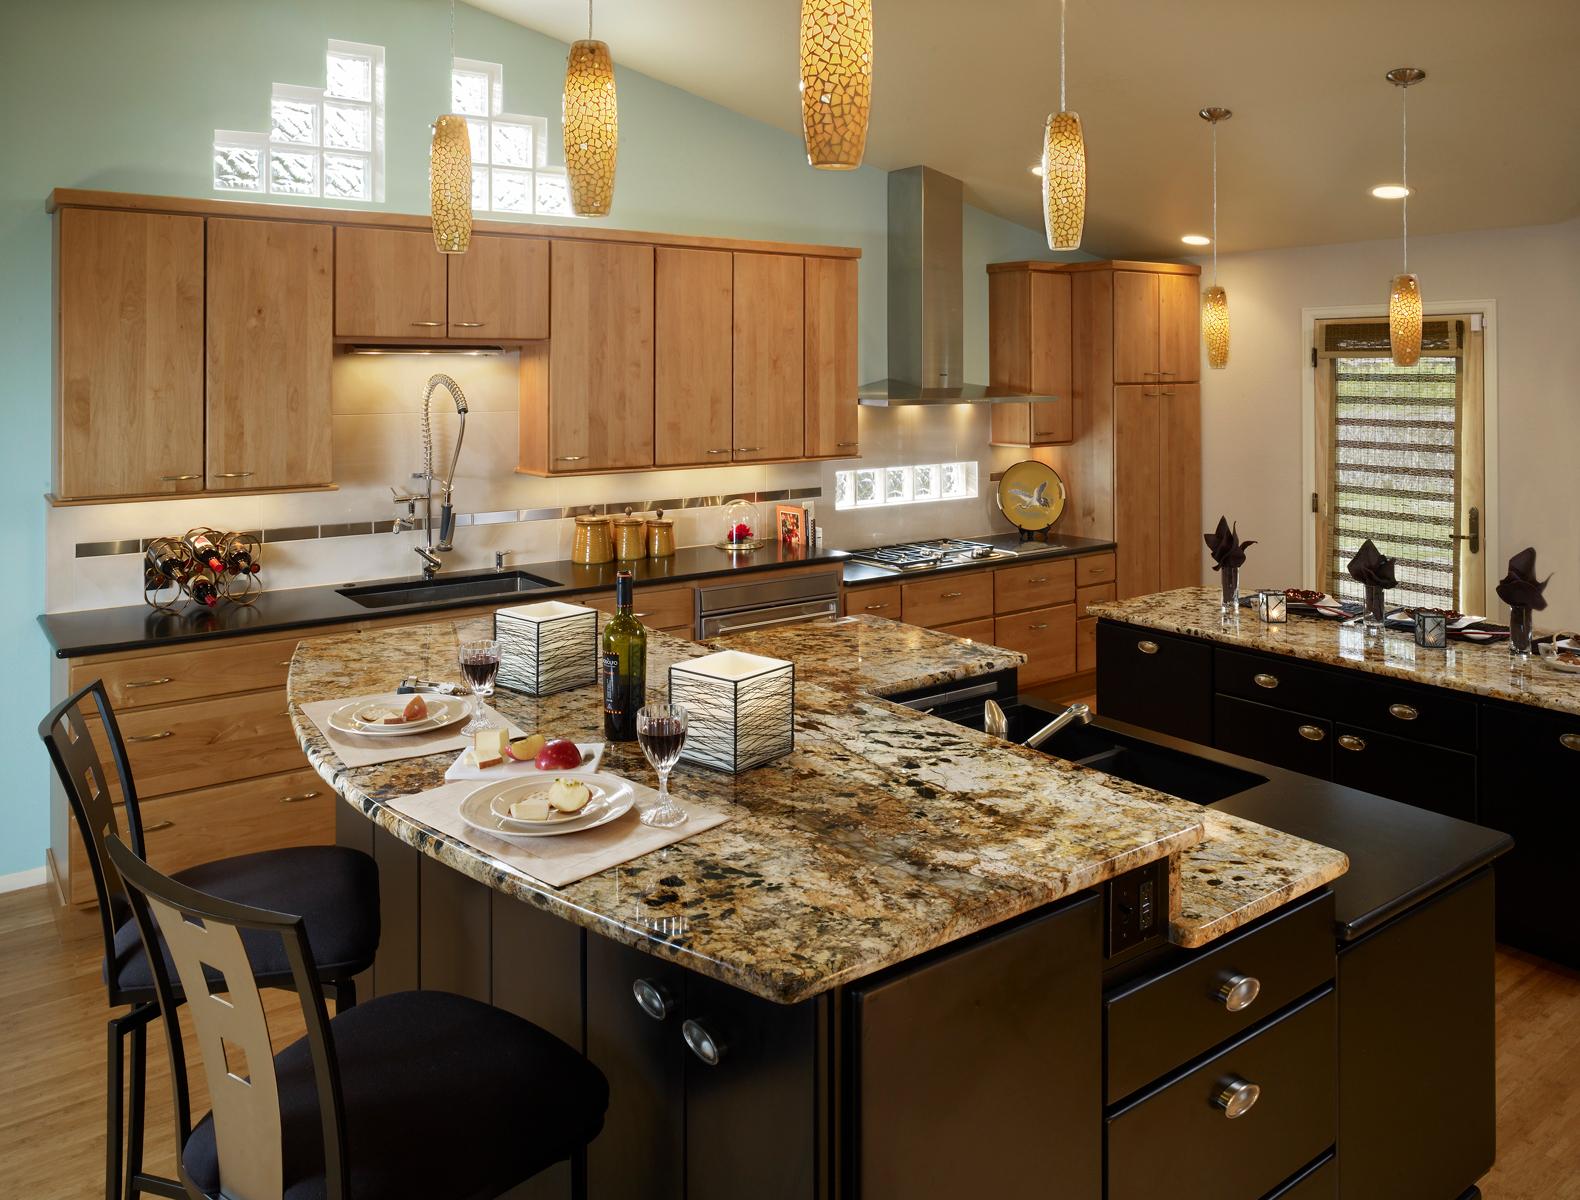 The Kitchen Showcase image 2